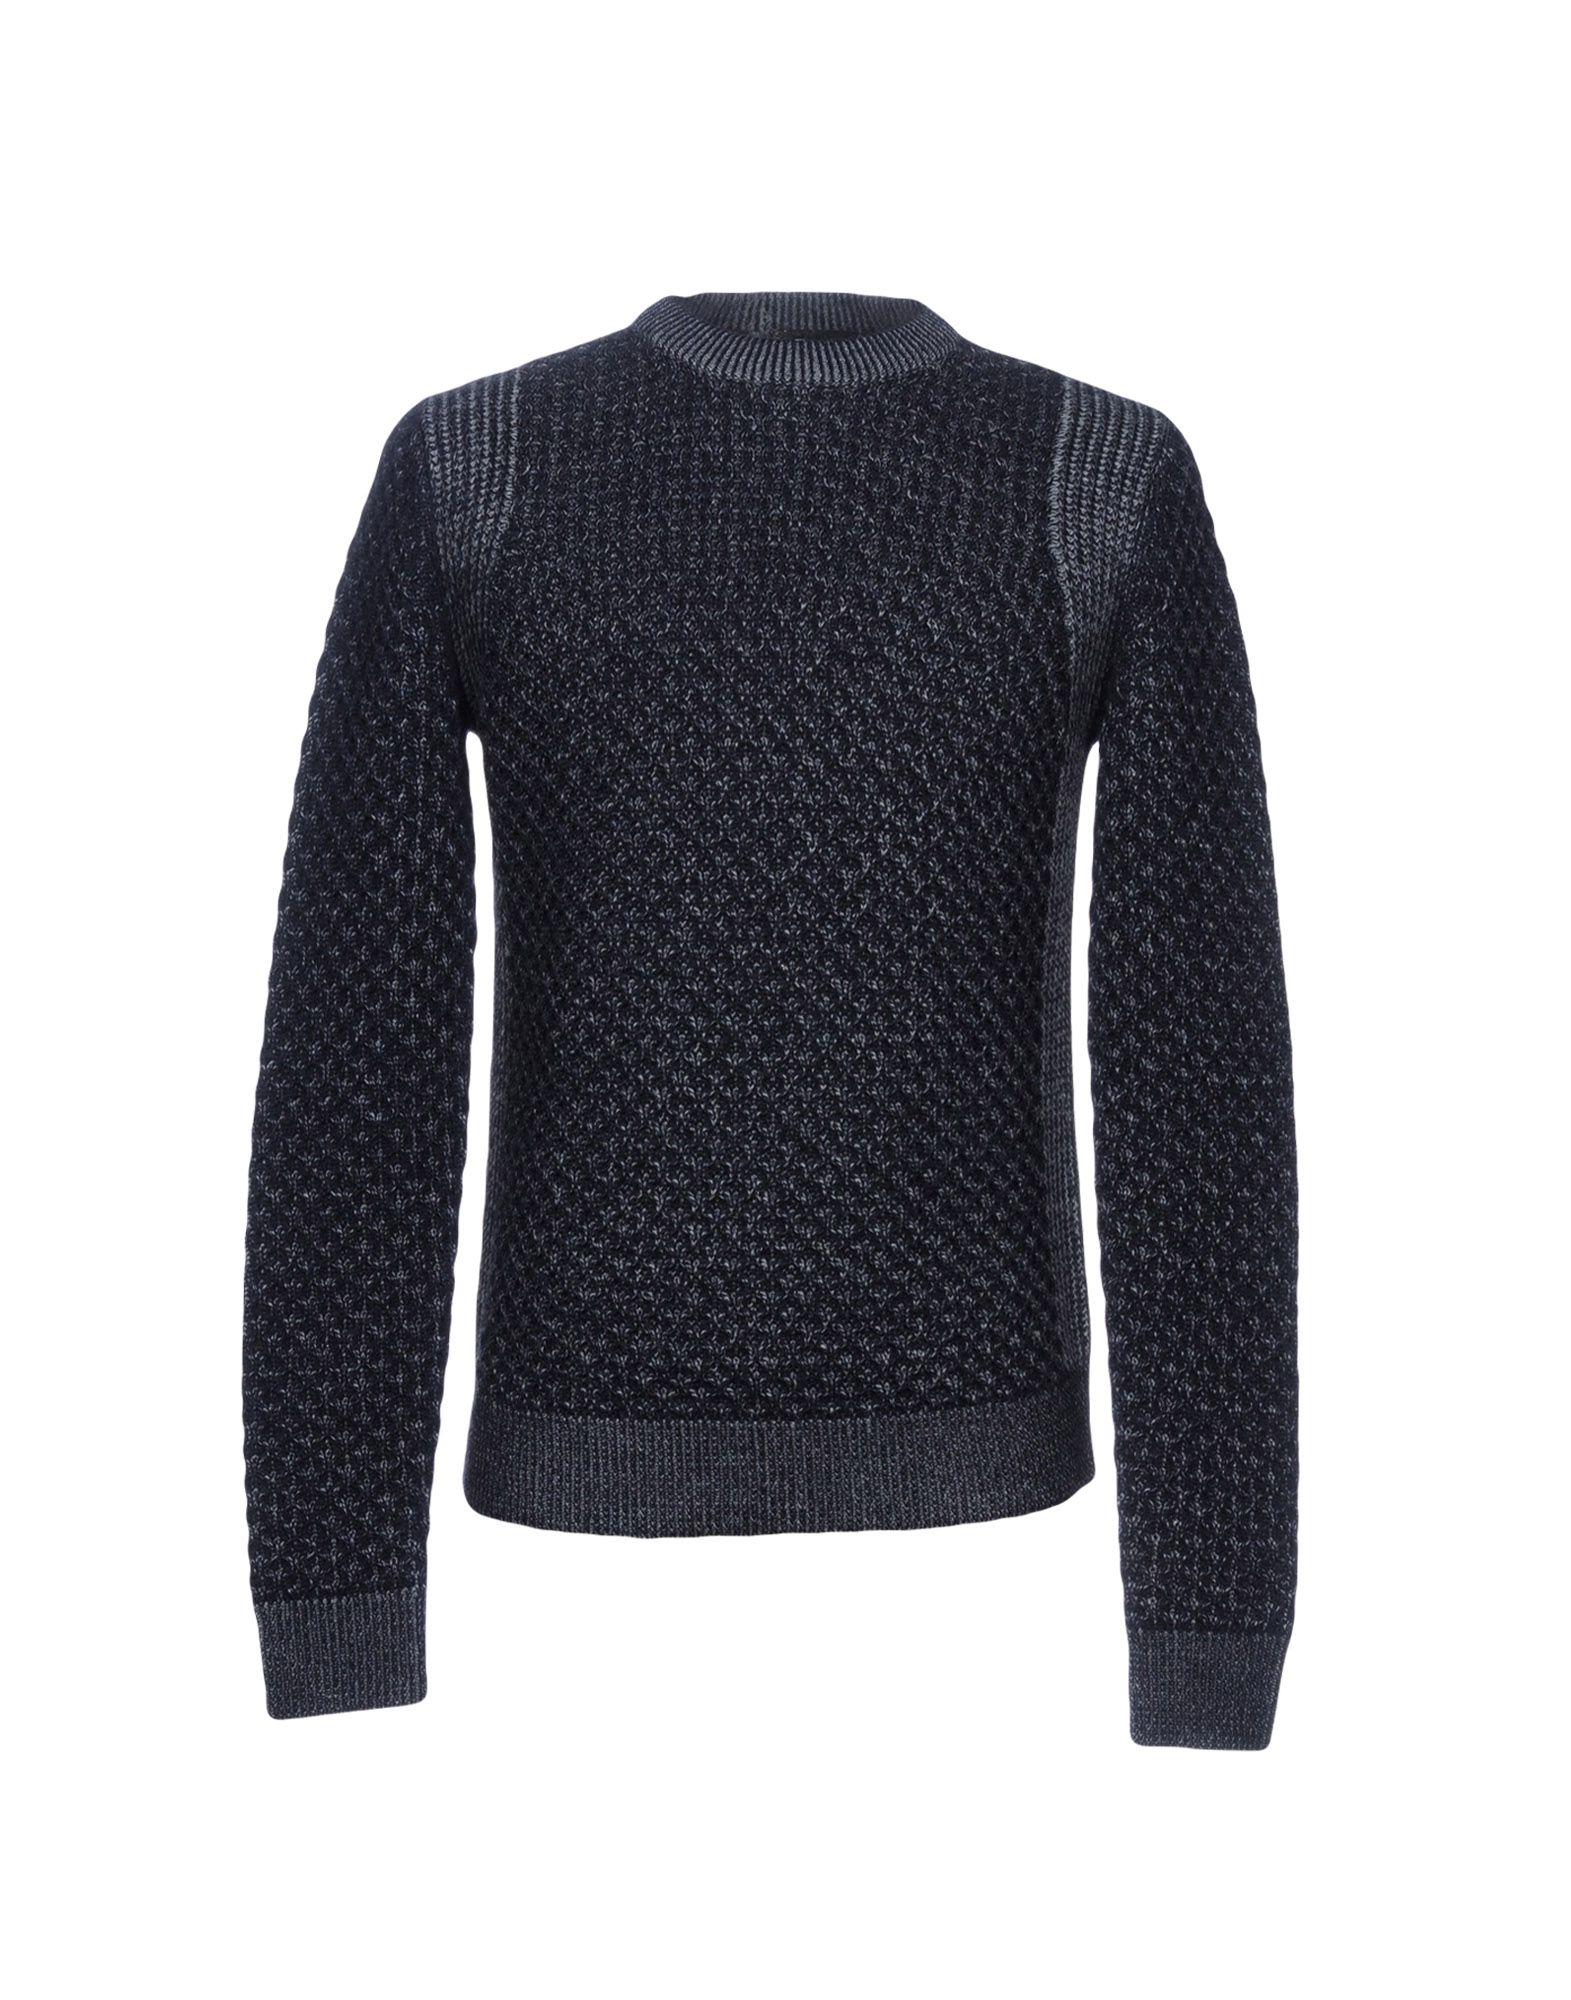 Pullover Theory Uomo - Acquista online su